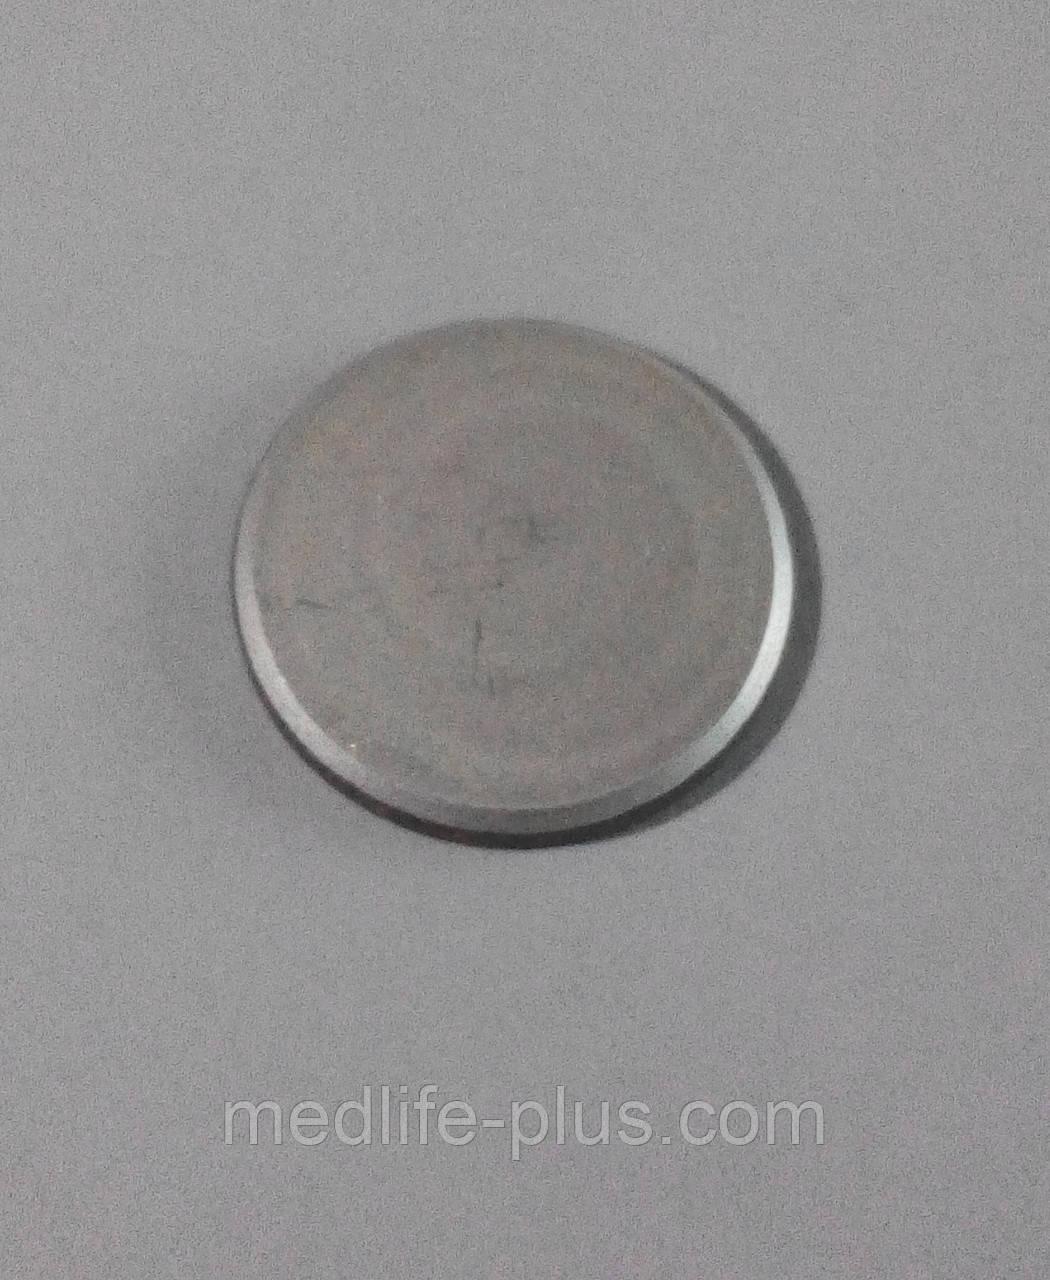 Пьезоэлемент тА7.124.006-03 d25х2,4 к УЗТ-1.01Ф ЭМА